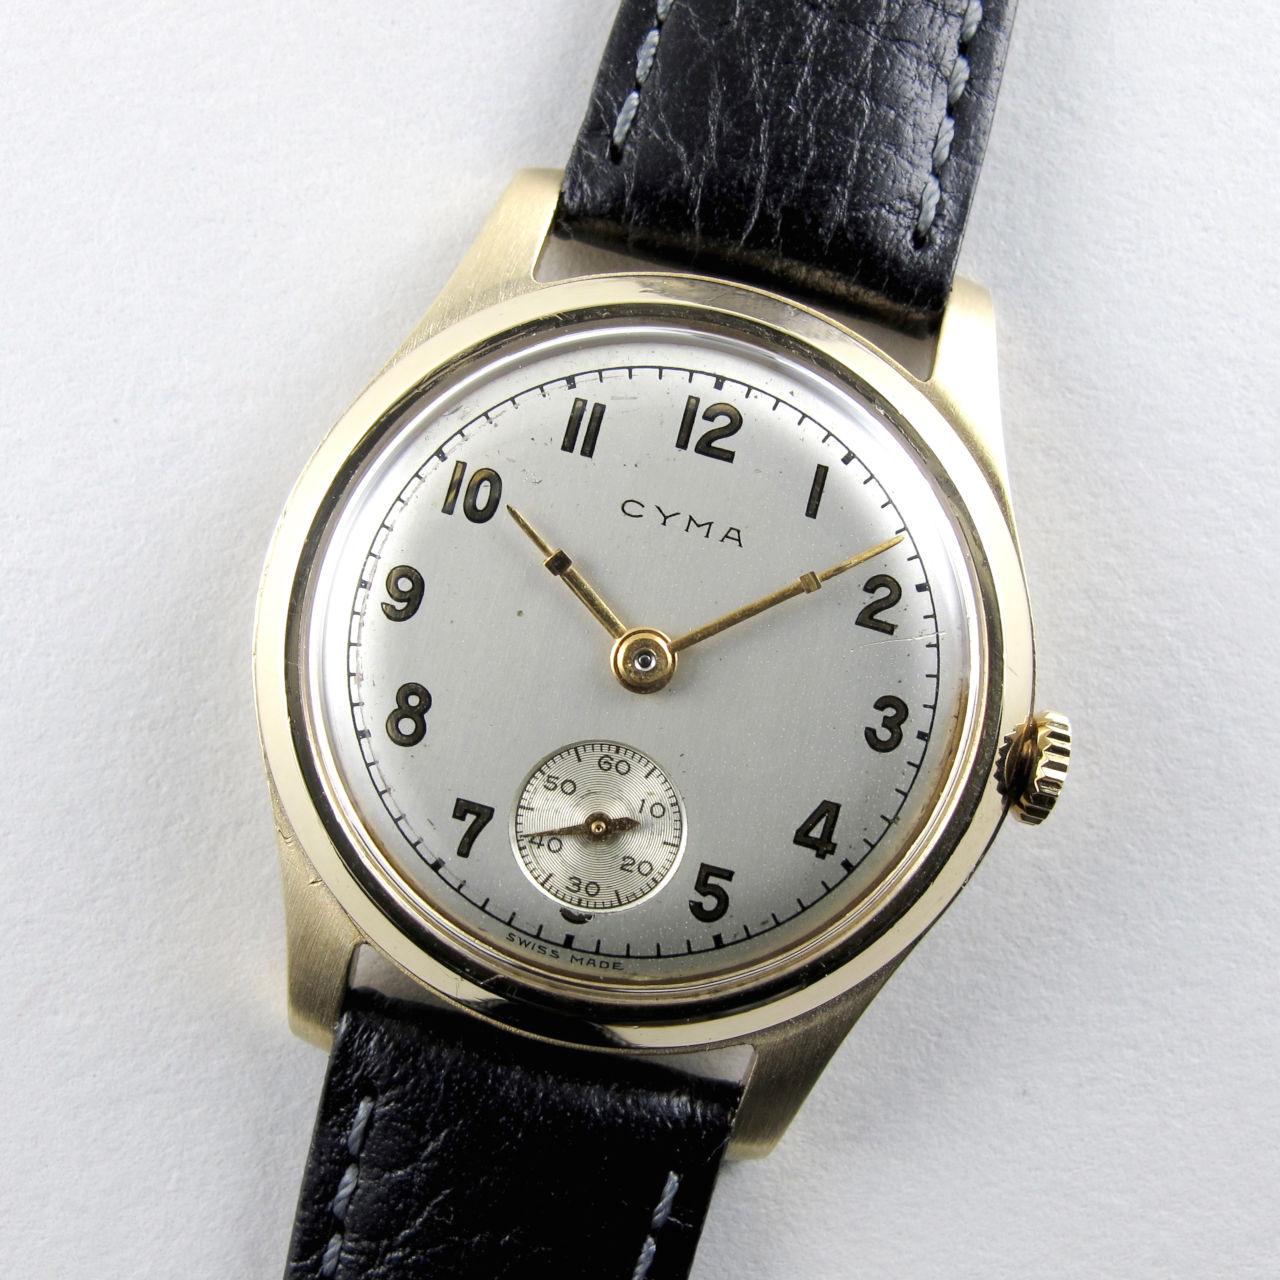 Cyma gold vintage wristwatch, hallmarked 1947